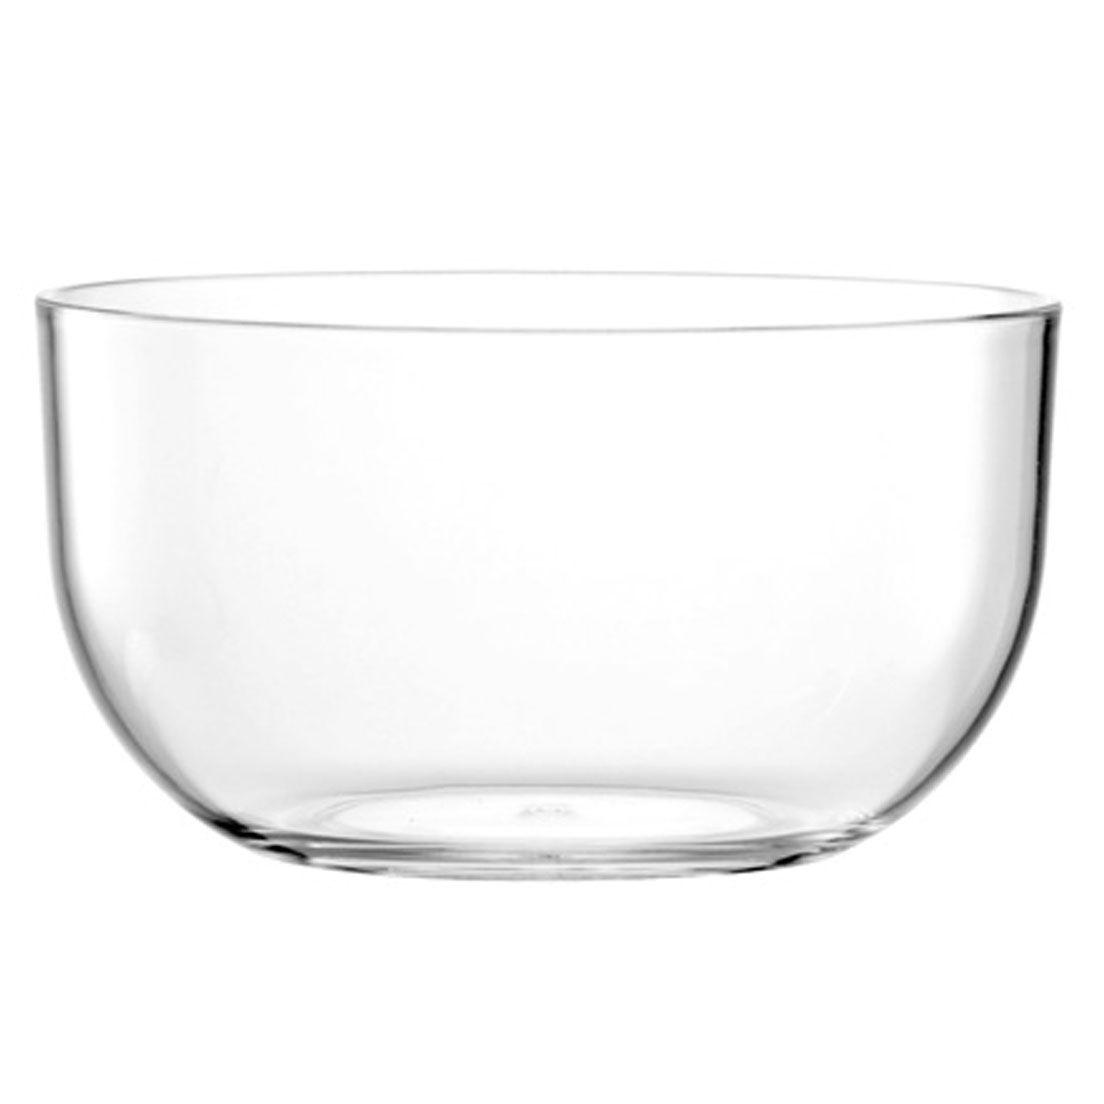 Bowl para Temperar ou Servir de Acrílico 1L